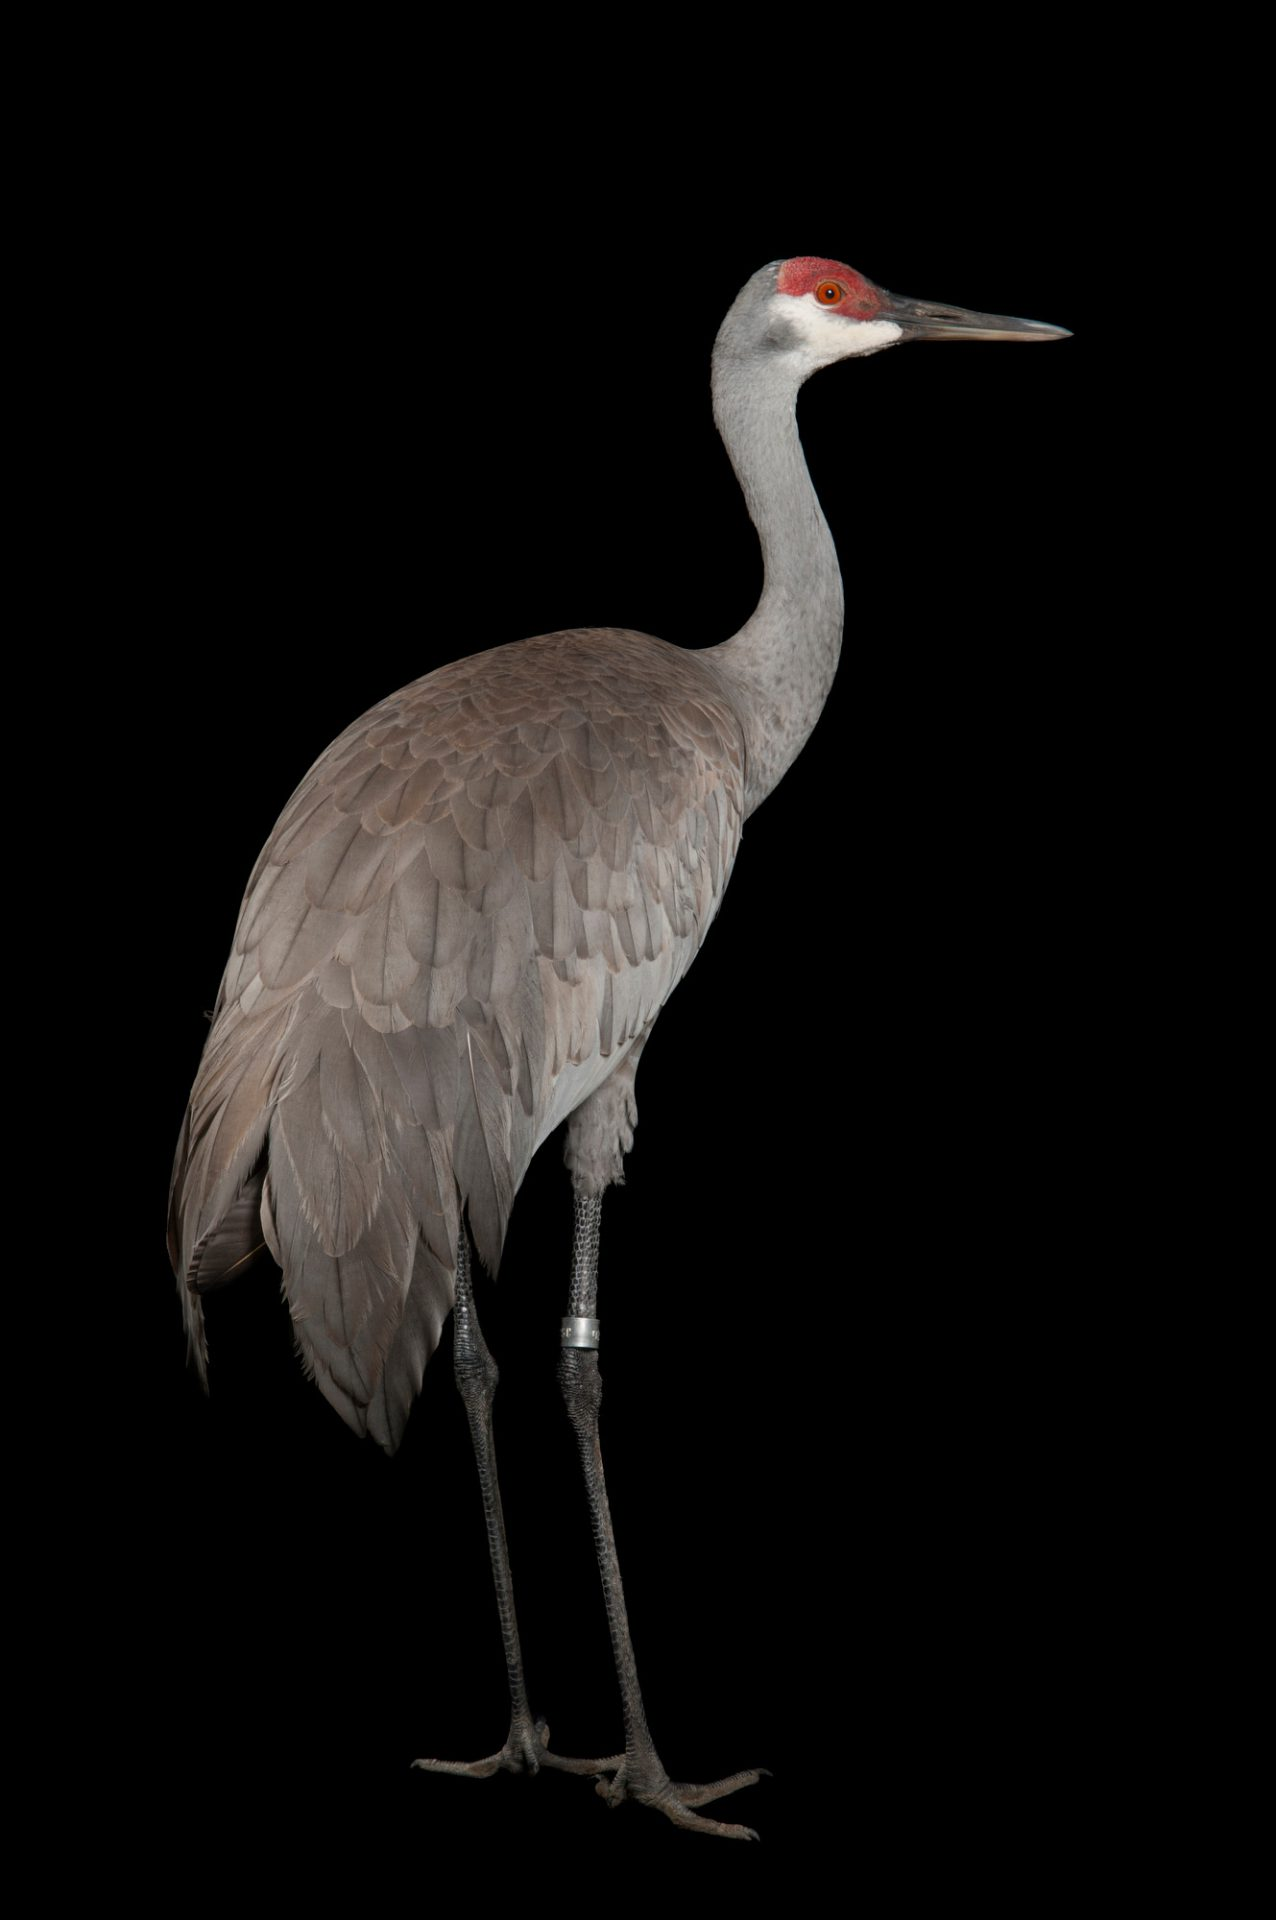 Sandhill Crane National Geographic >> Esa001 00489 Joel Sartore